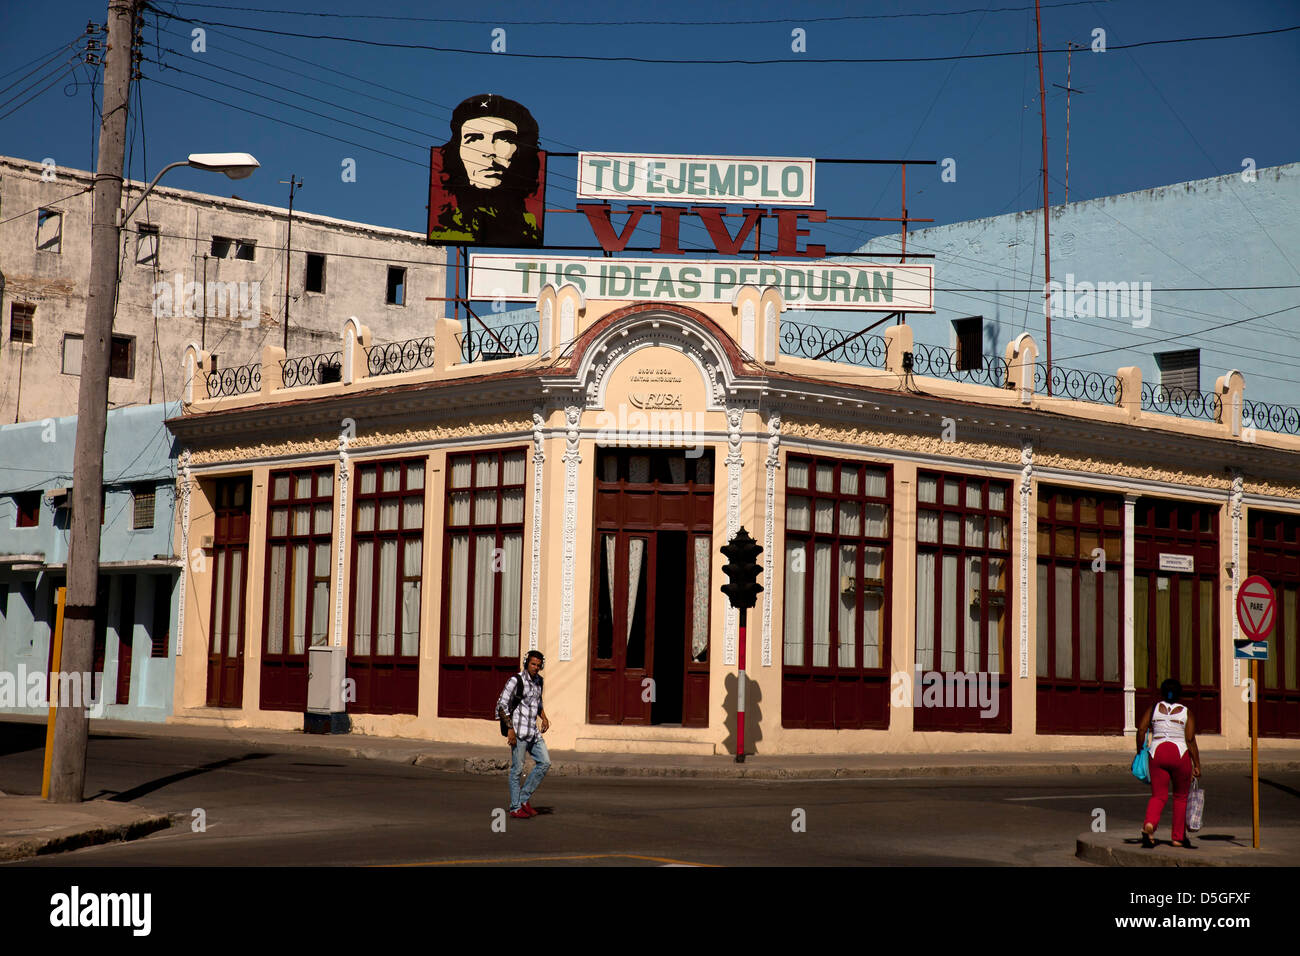 Che Guevara image and propaganda on a typical building in Cienfuegos, Cuba, Caribbean - Stock Image